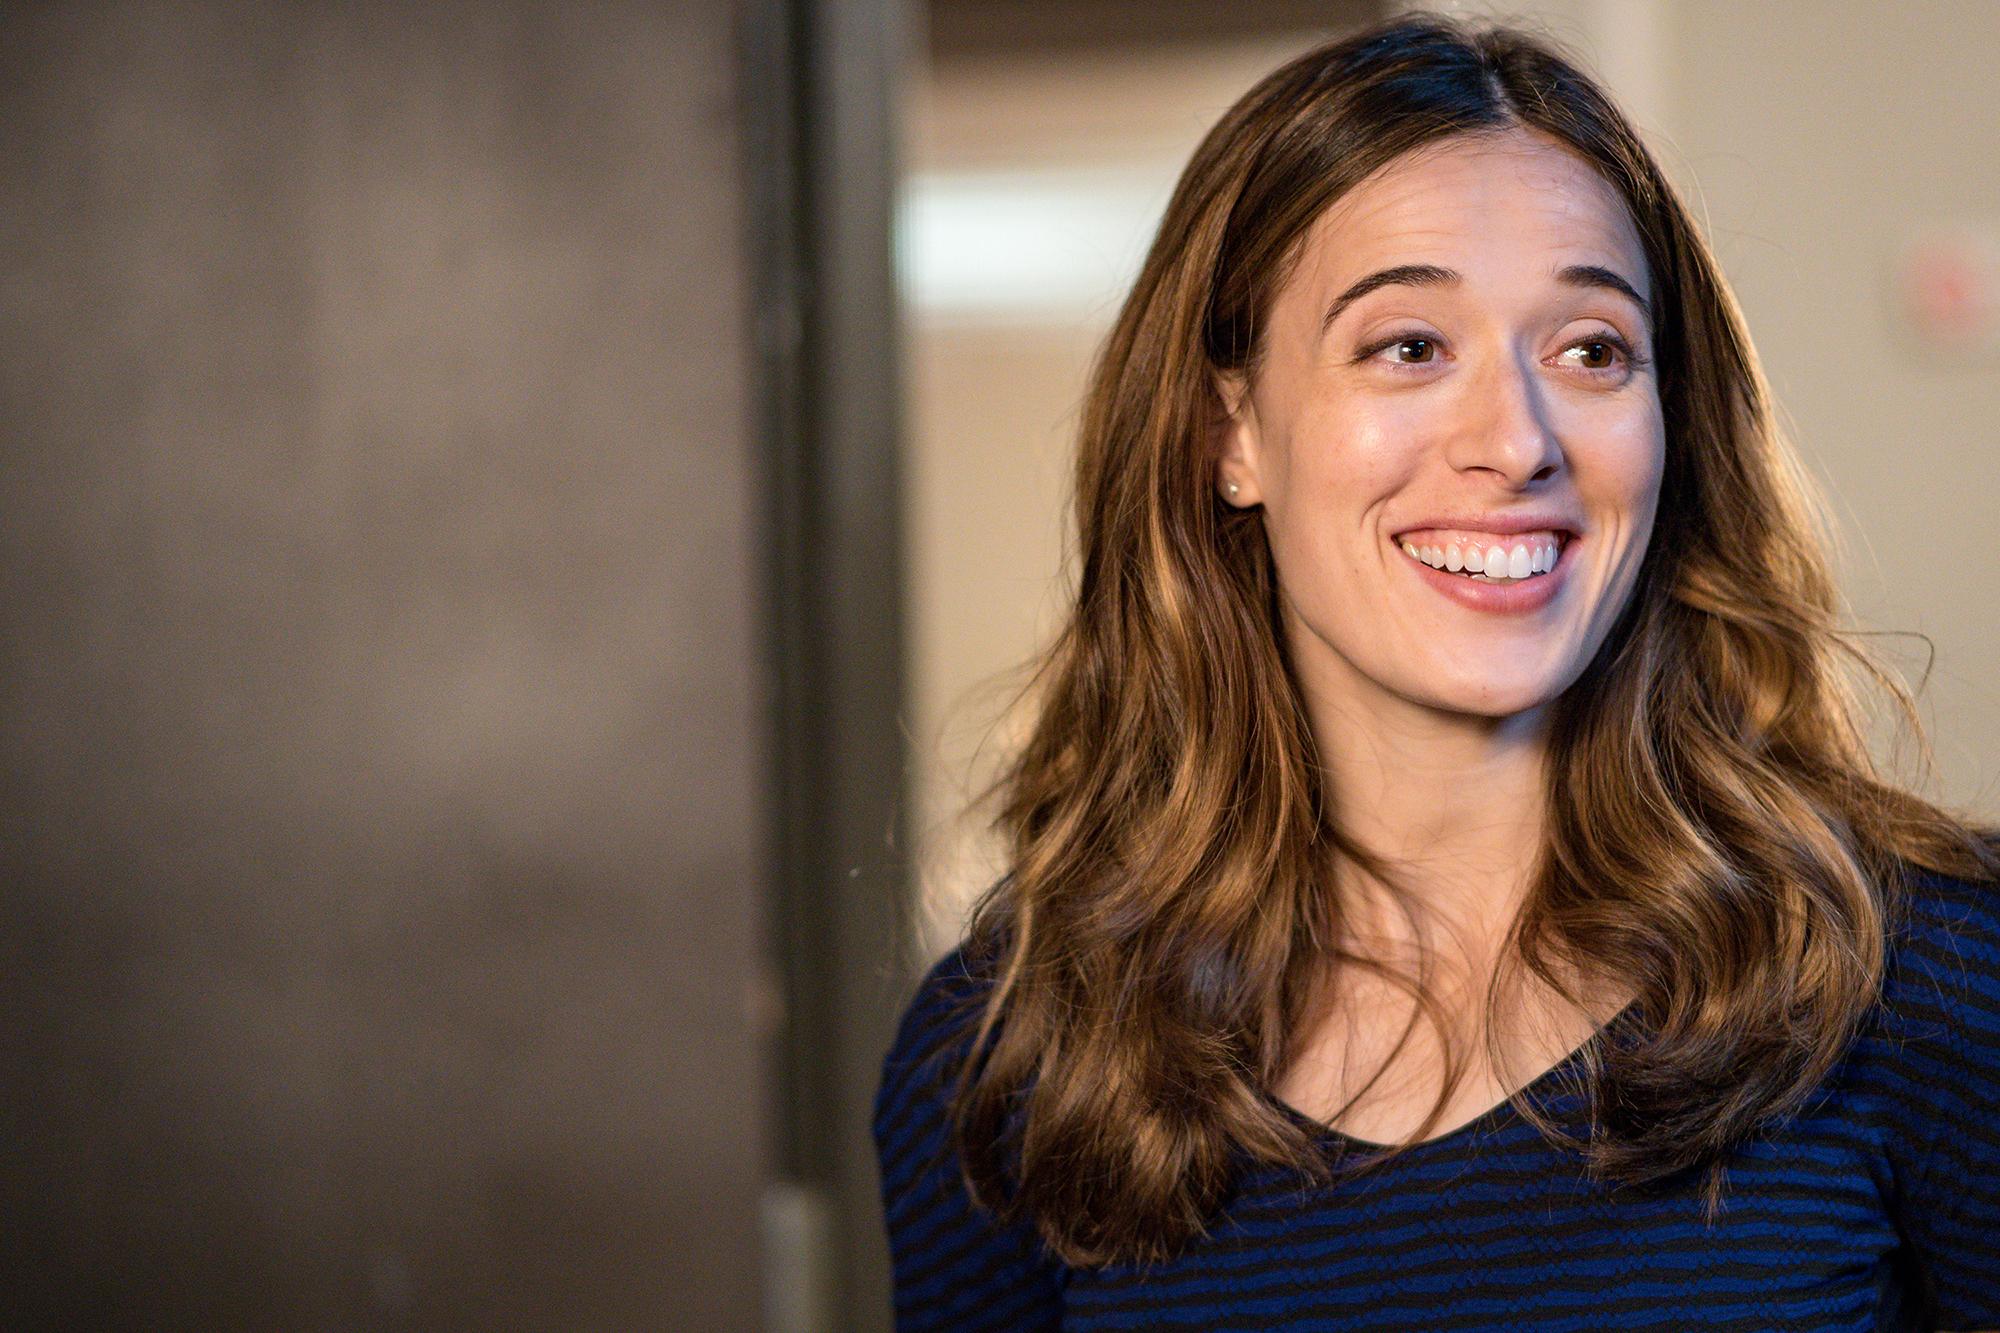 Chicago P D 's Marina Squerciati Talks Shocking New Romance